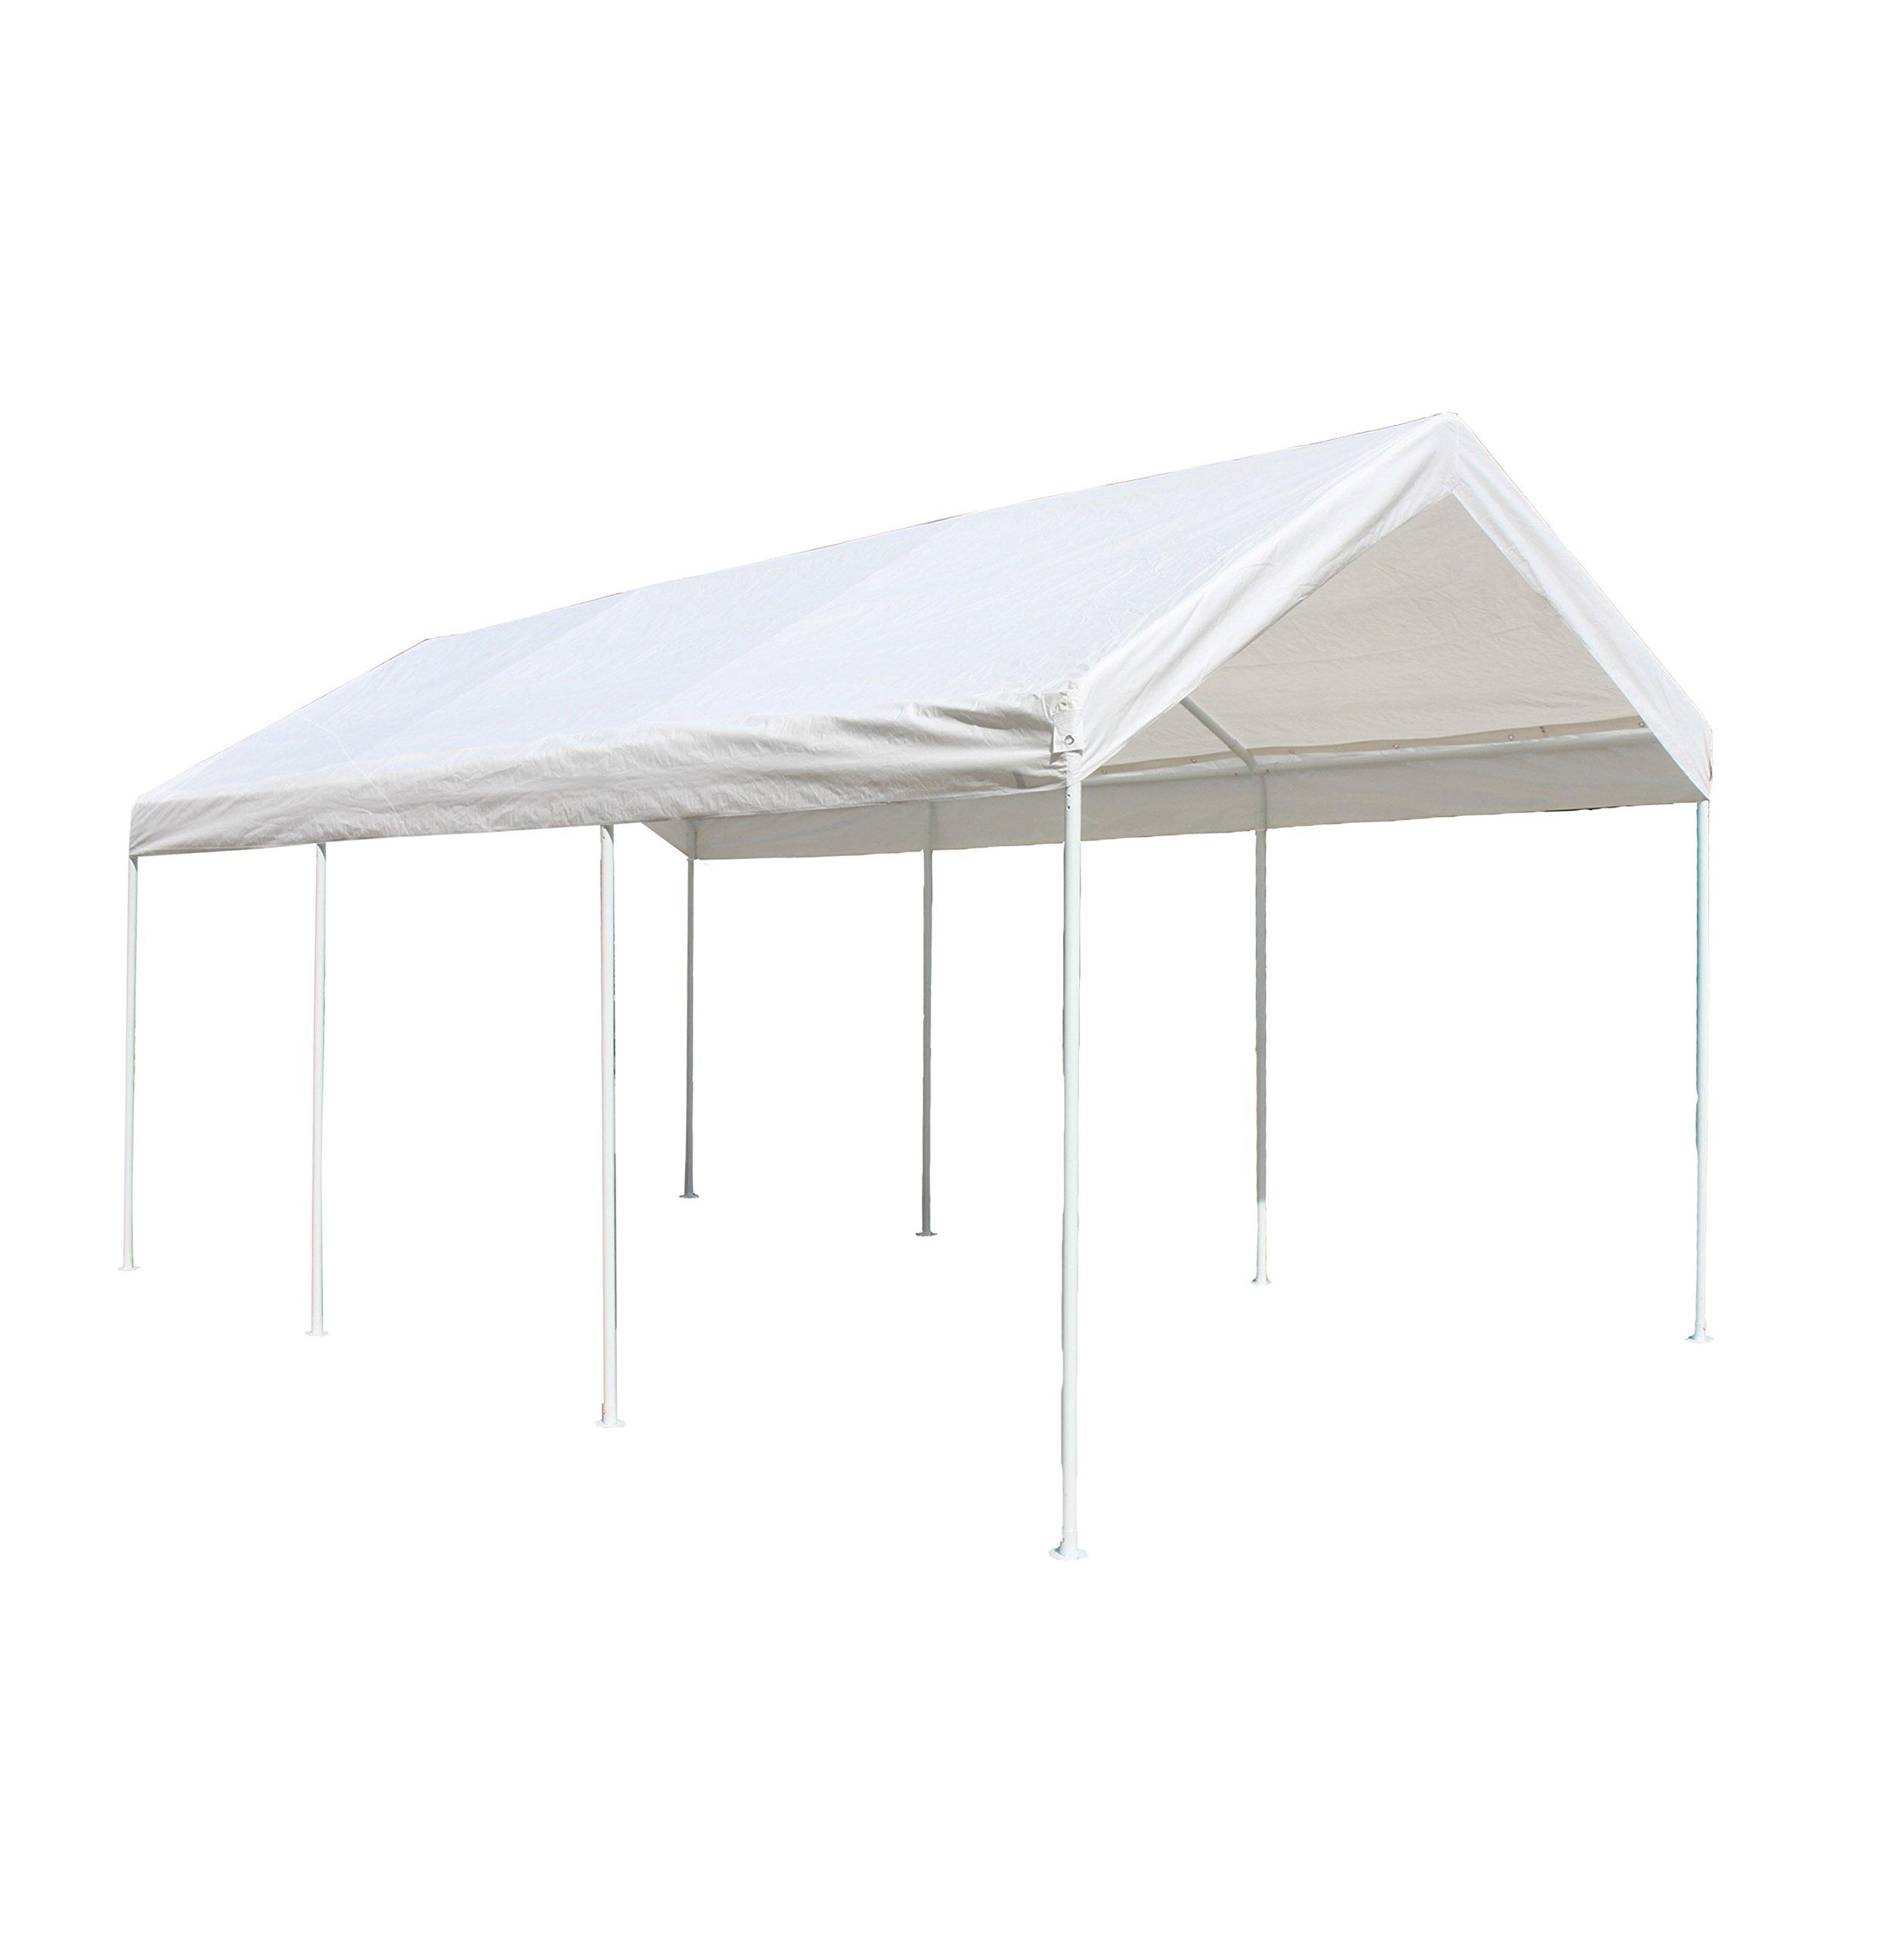 ALEKO CP1020NS 10 X 20 Heavy Duty Steel Frame Carport, Polyethylene Party Tent in White